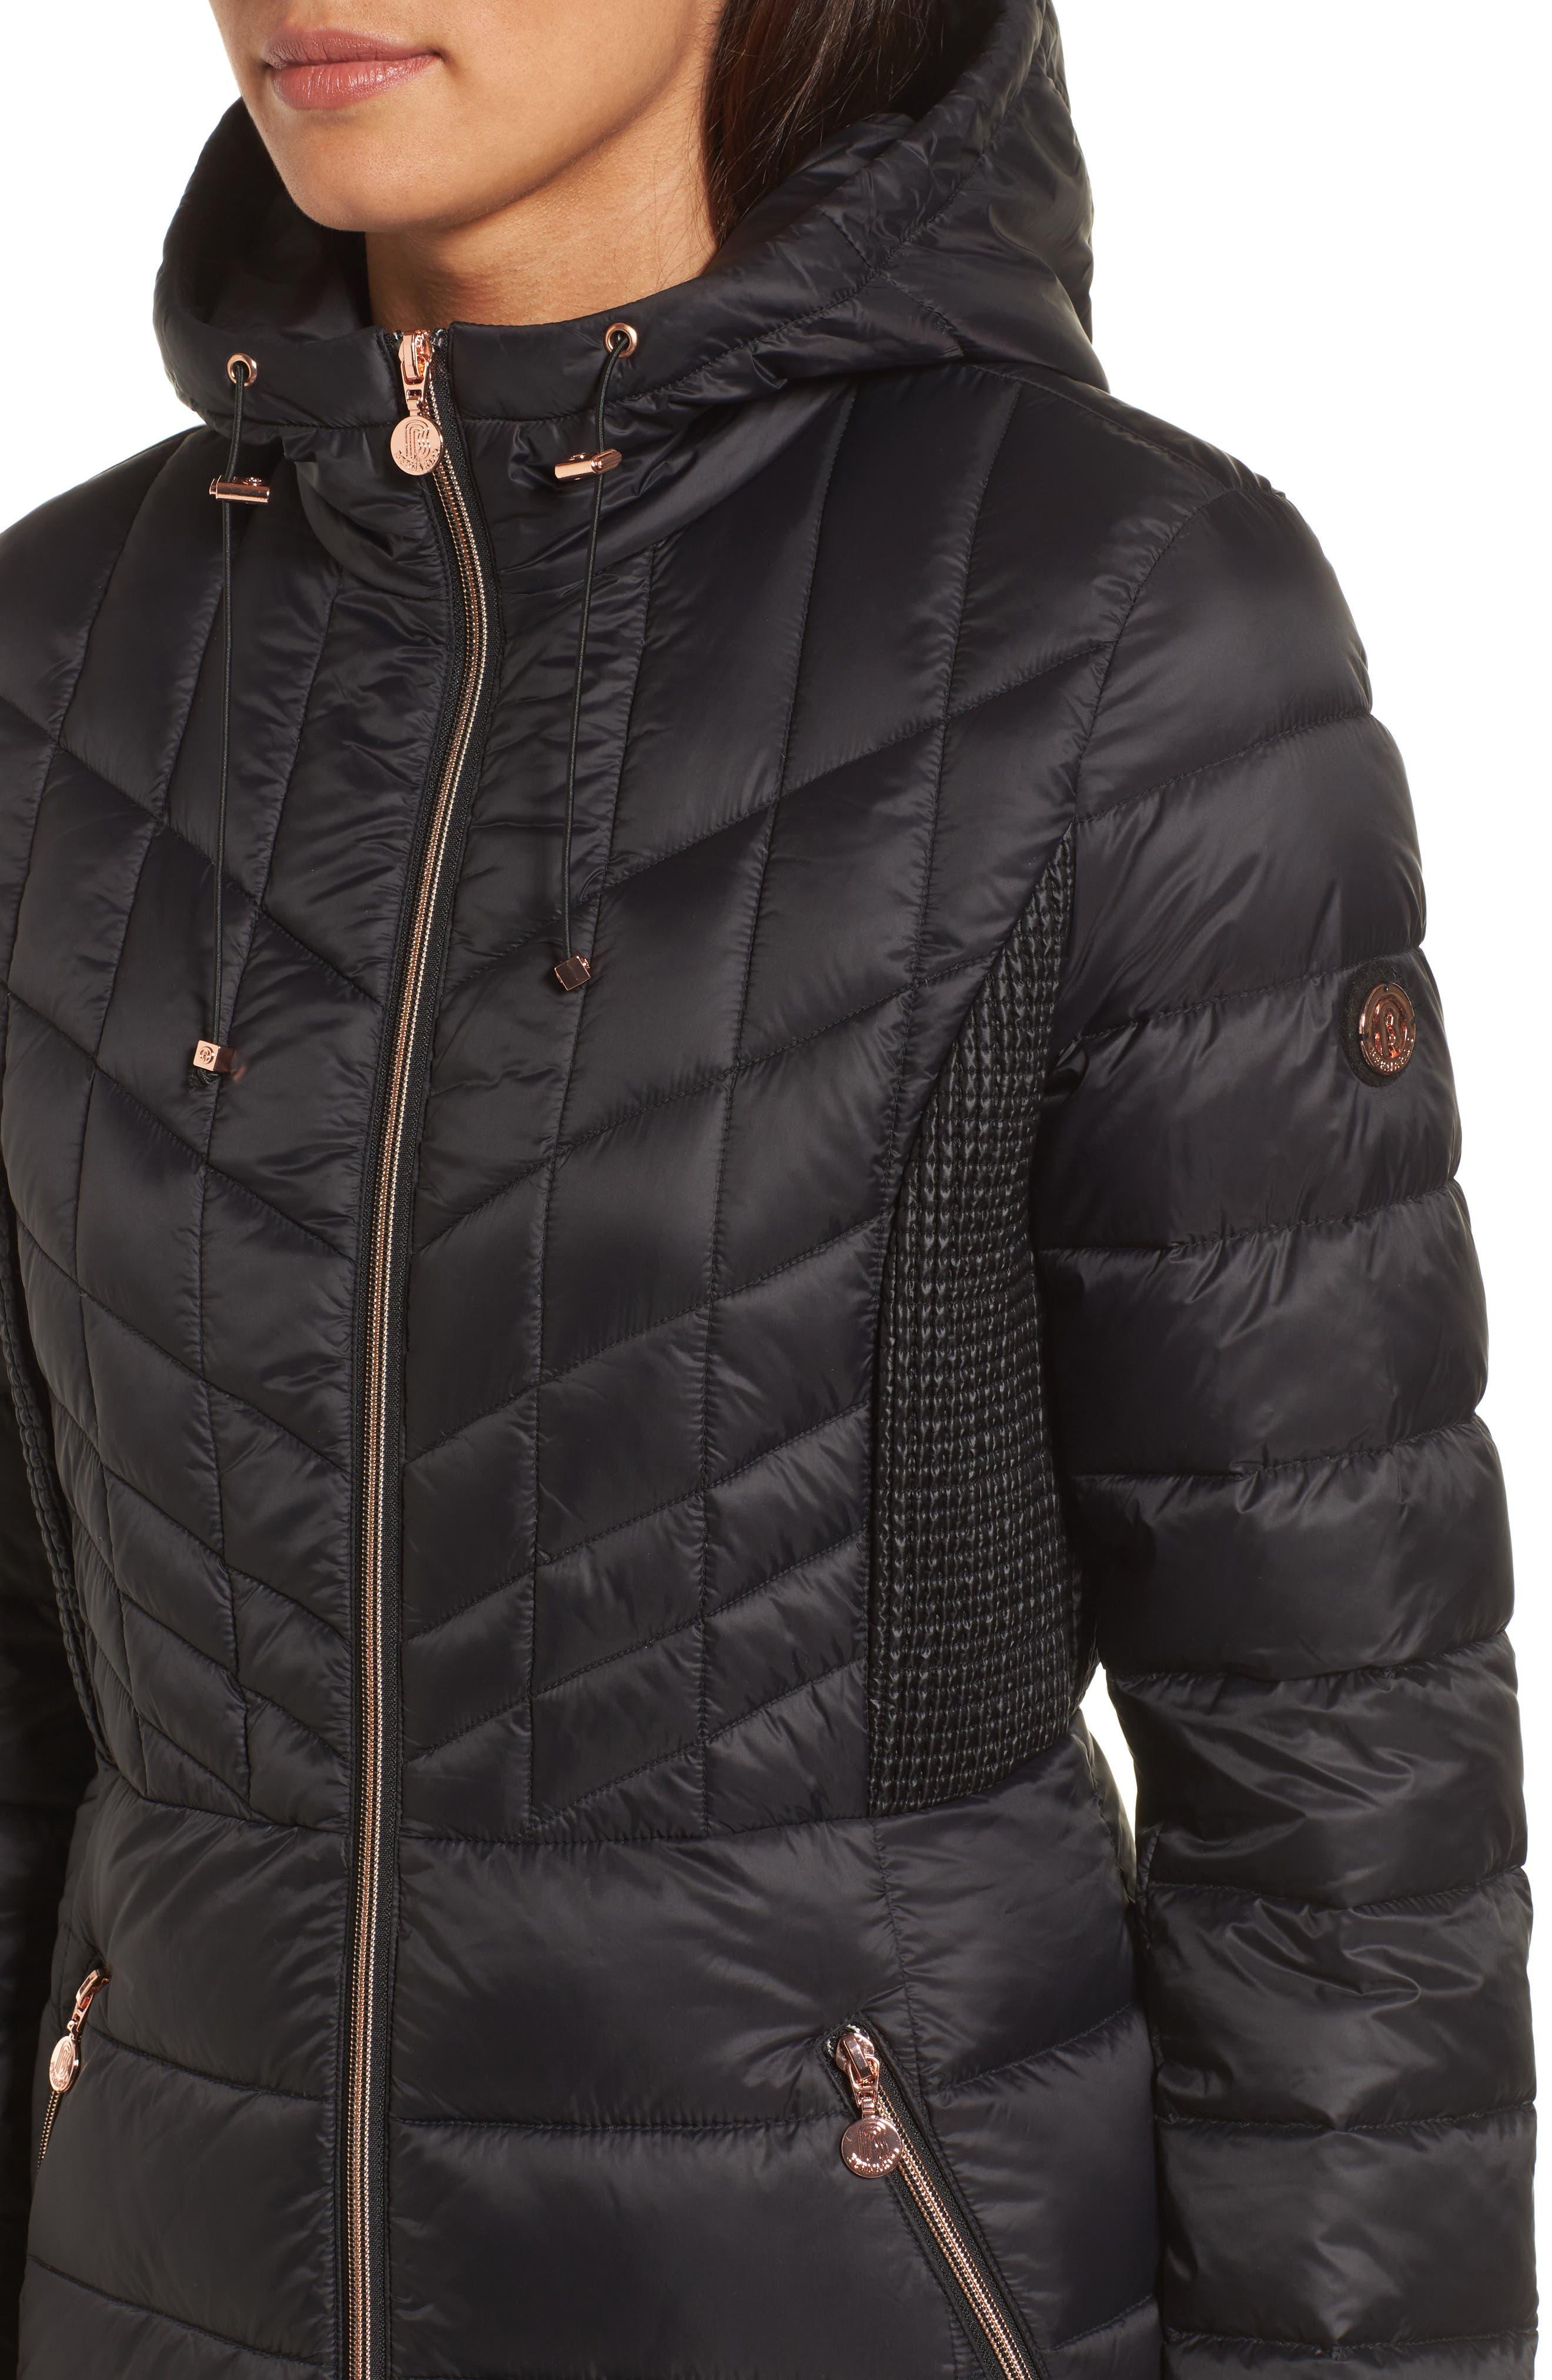 BERNARDO, Hooded Packable Down & PrimaLoft<sup>®</sup> Coat, Alternate thumbnail 5, color, BLACK